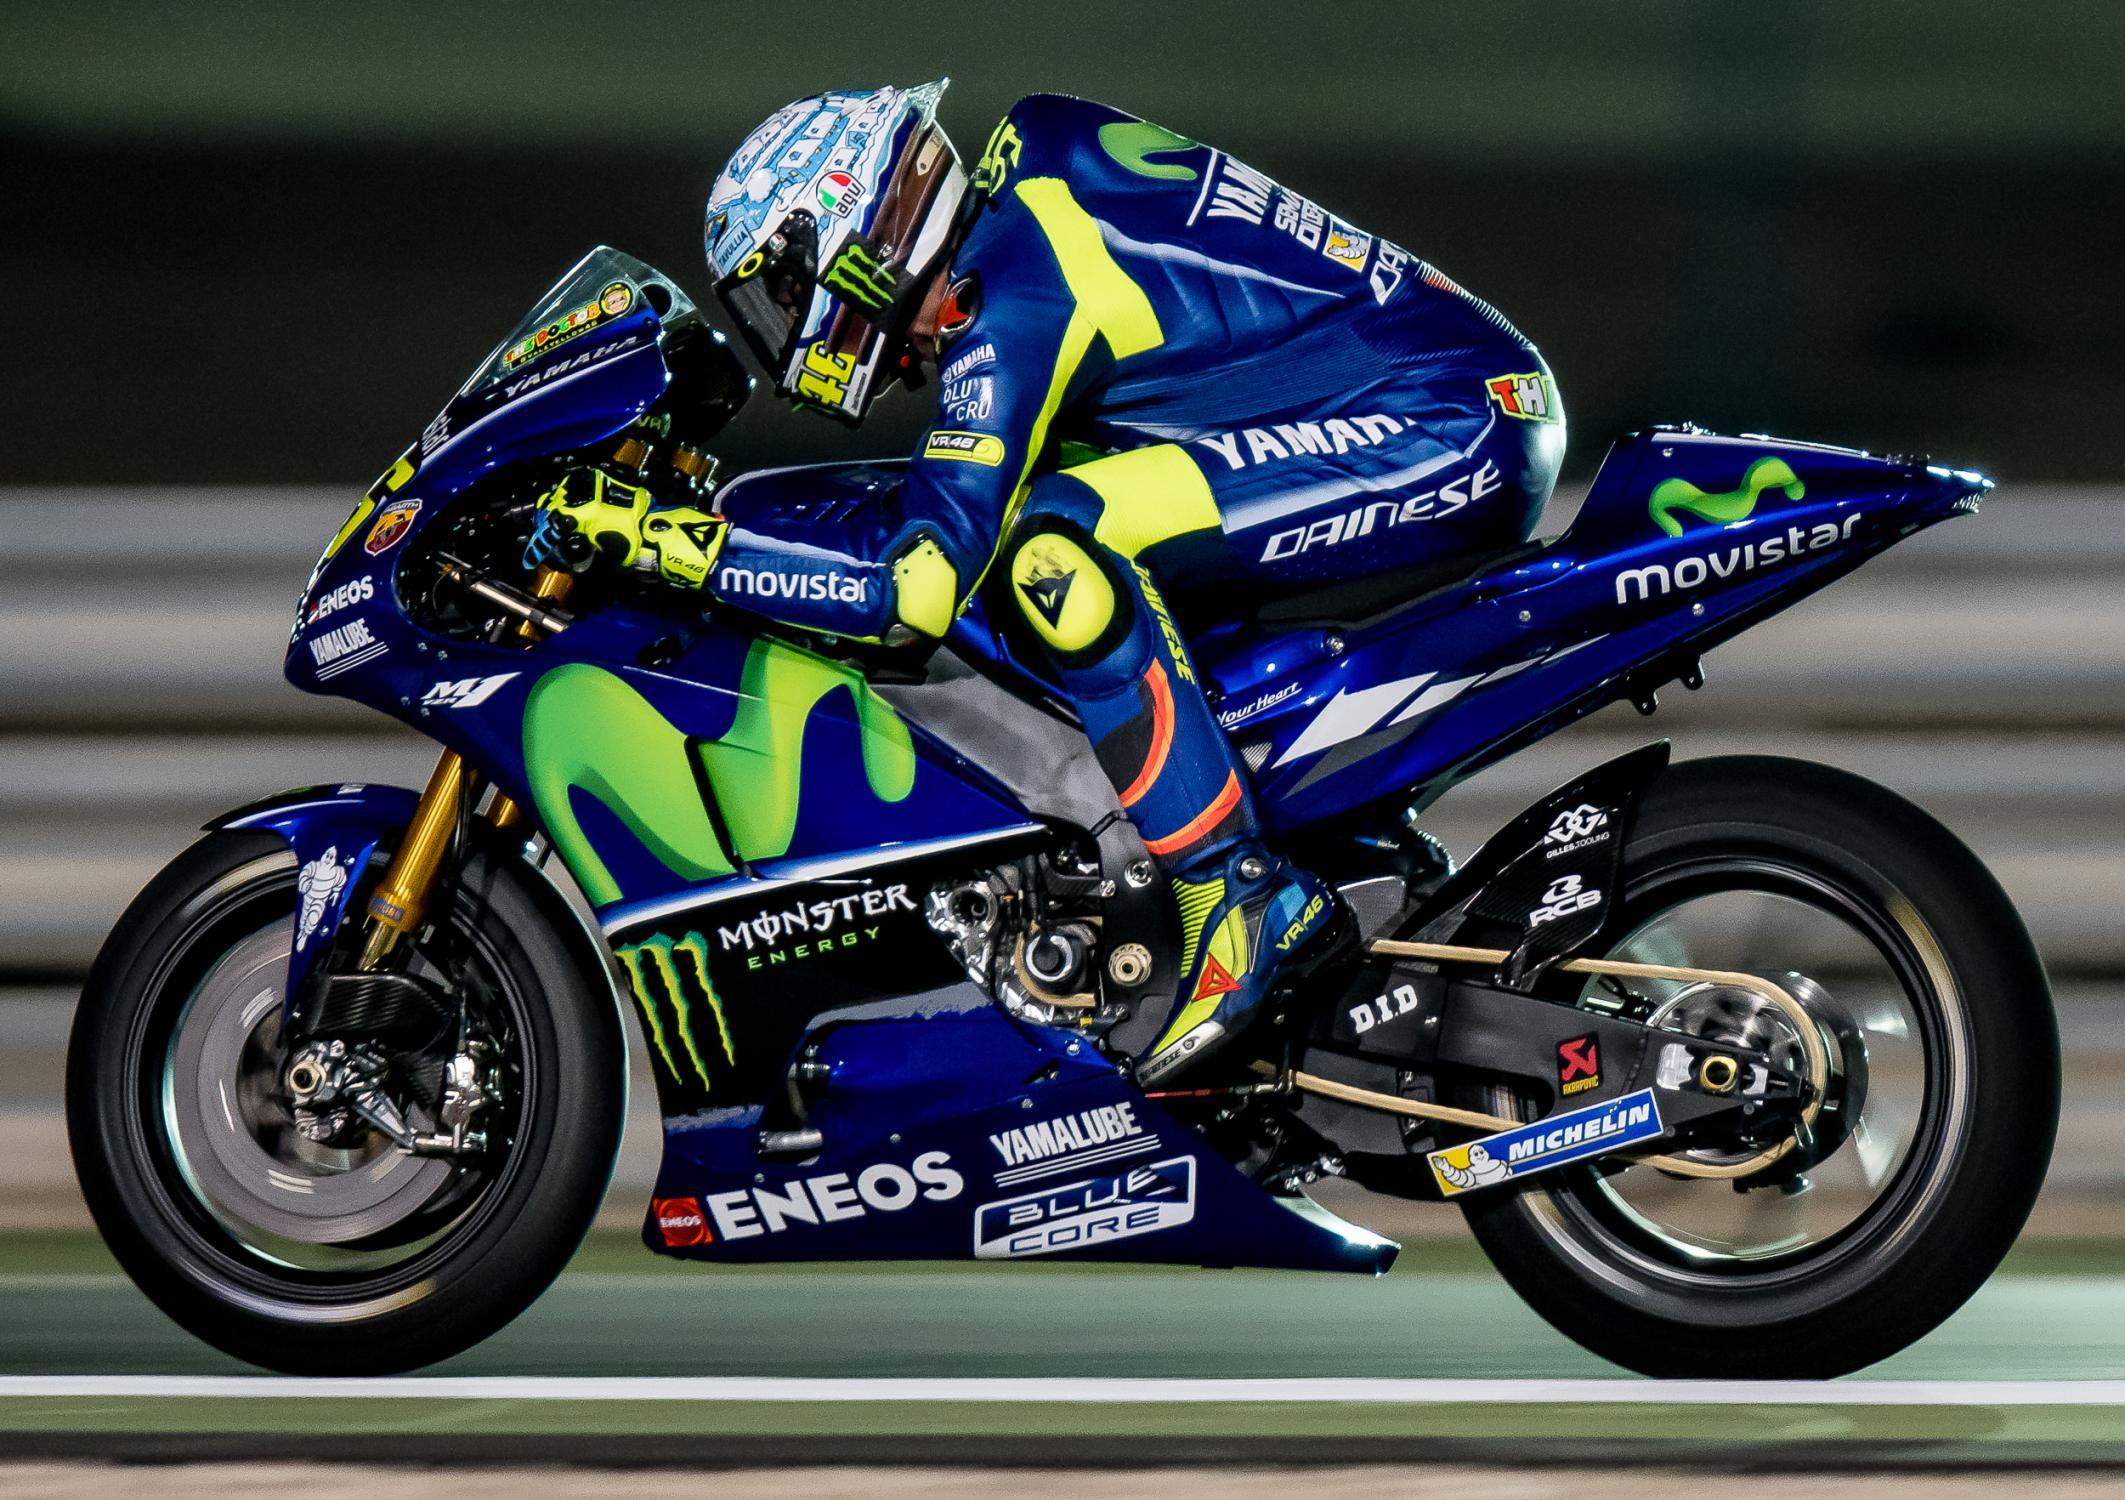 [MotoGP] Test Losail 46-valentino-rossi-itadsc_5145.gallery_full_top_fullscreen